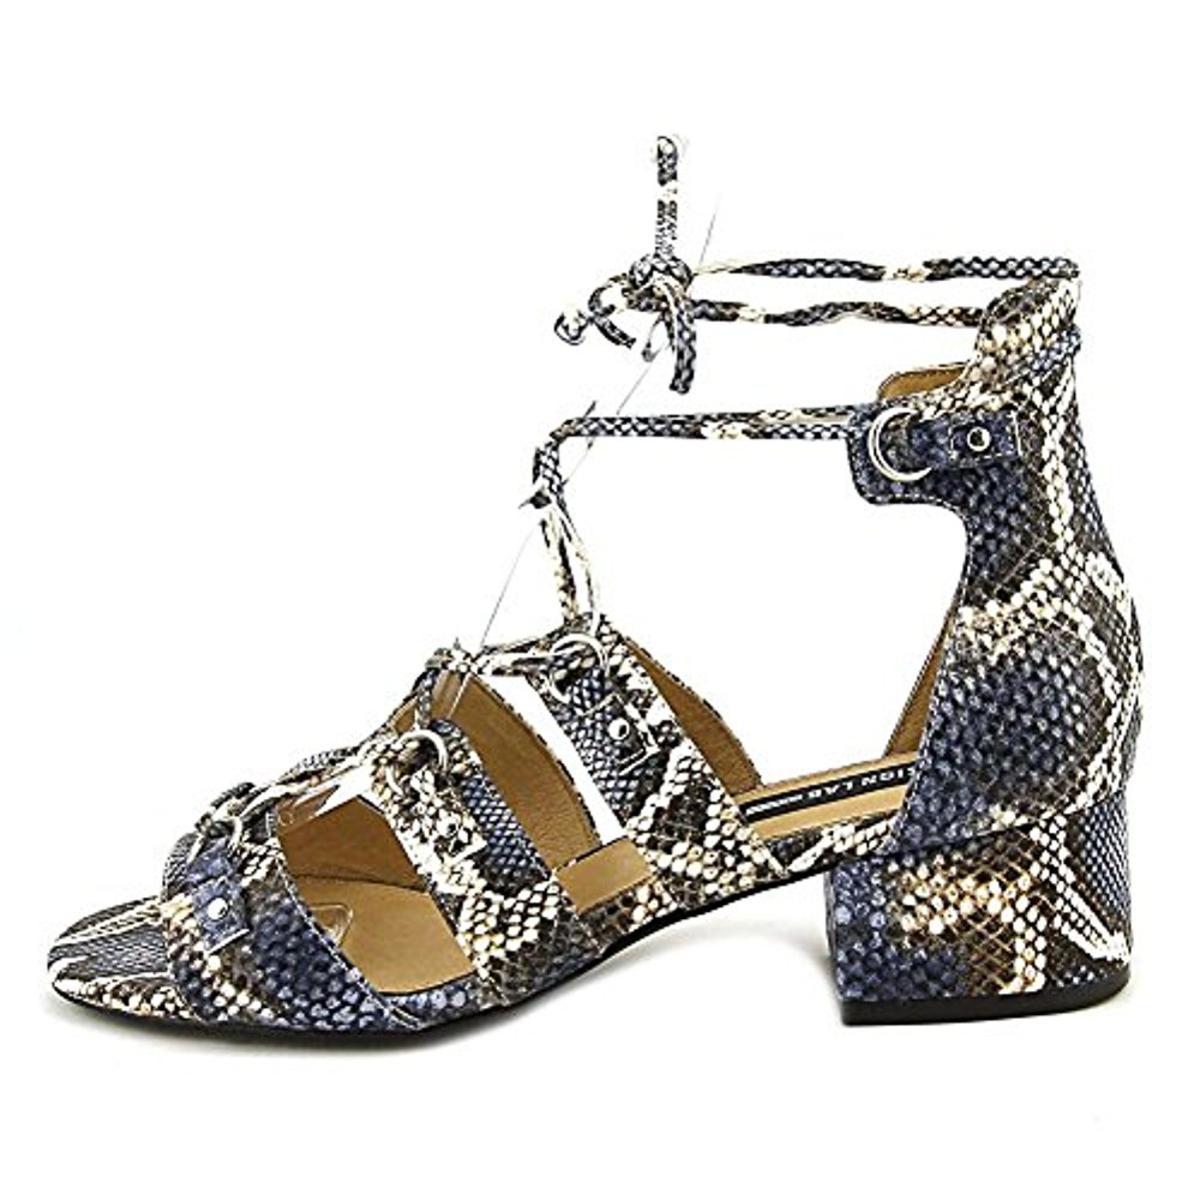 Design-Lab-Womens-Eldy-Block-Heel-Dress-Sandals-Shoes-BHFO-2676 thumbnail 13